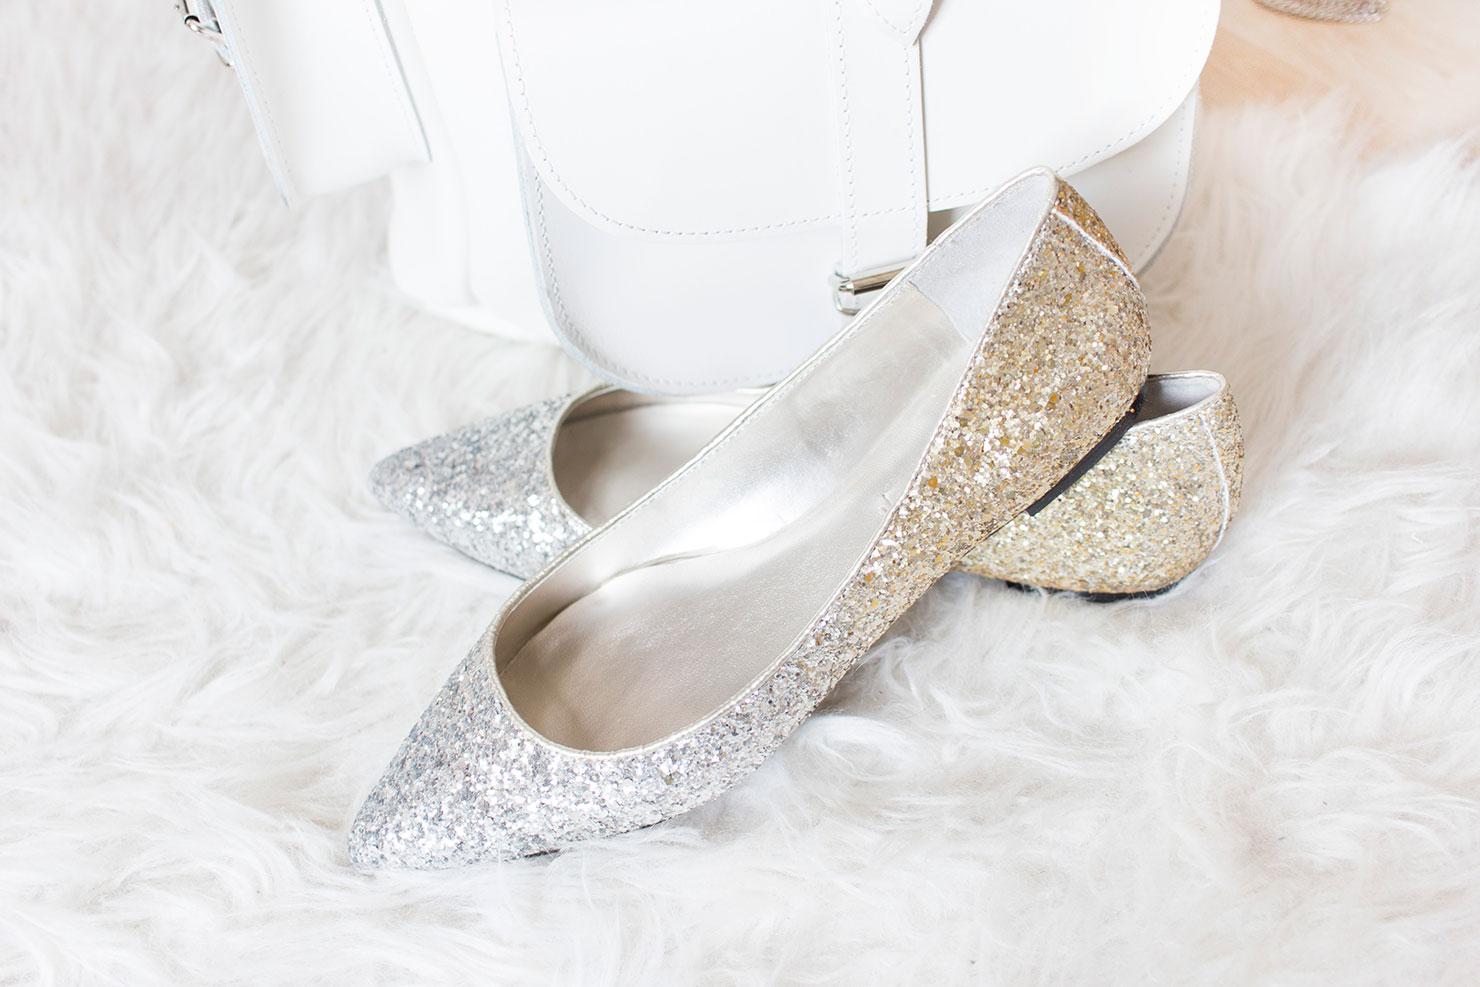 cathy couture zara ballerinas gold glitter